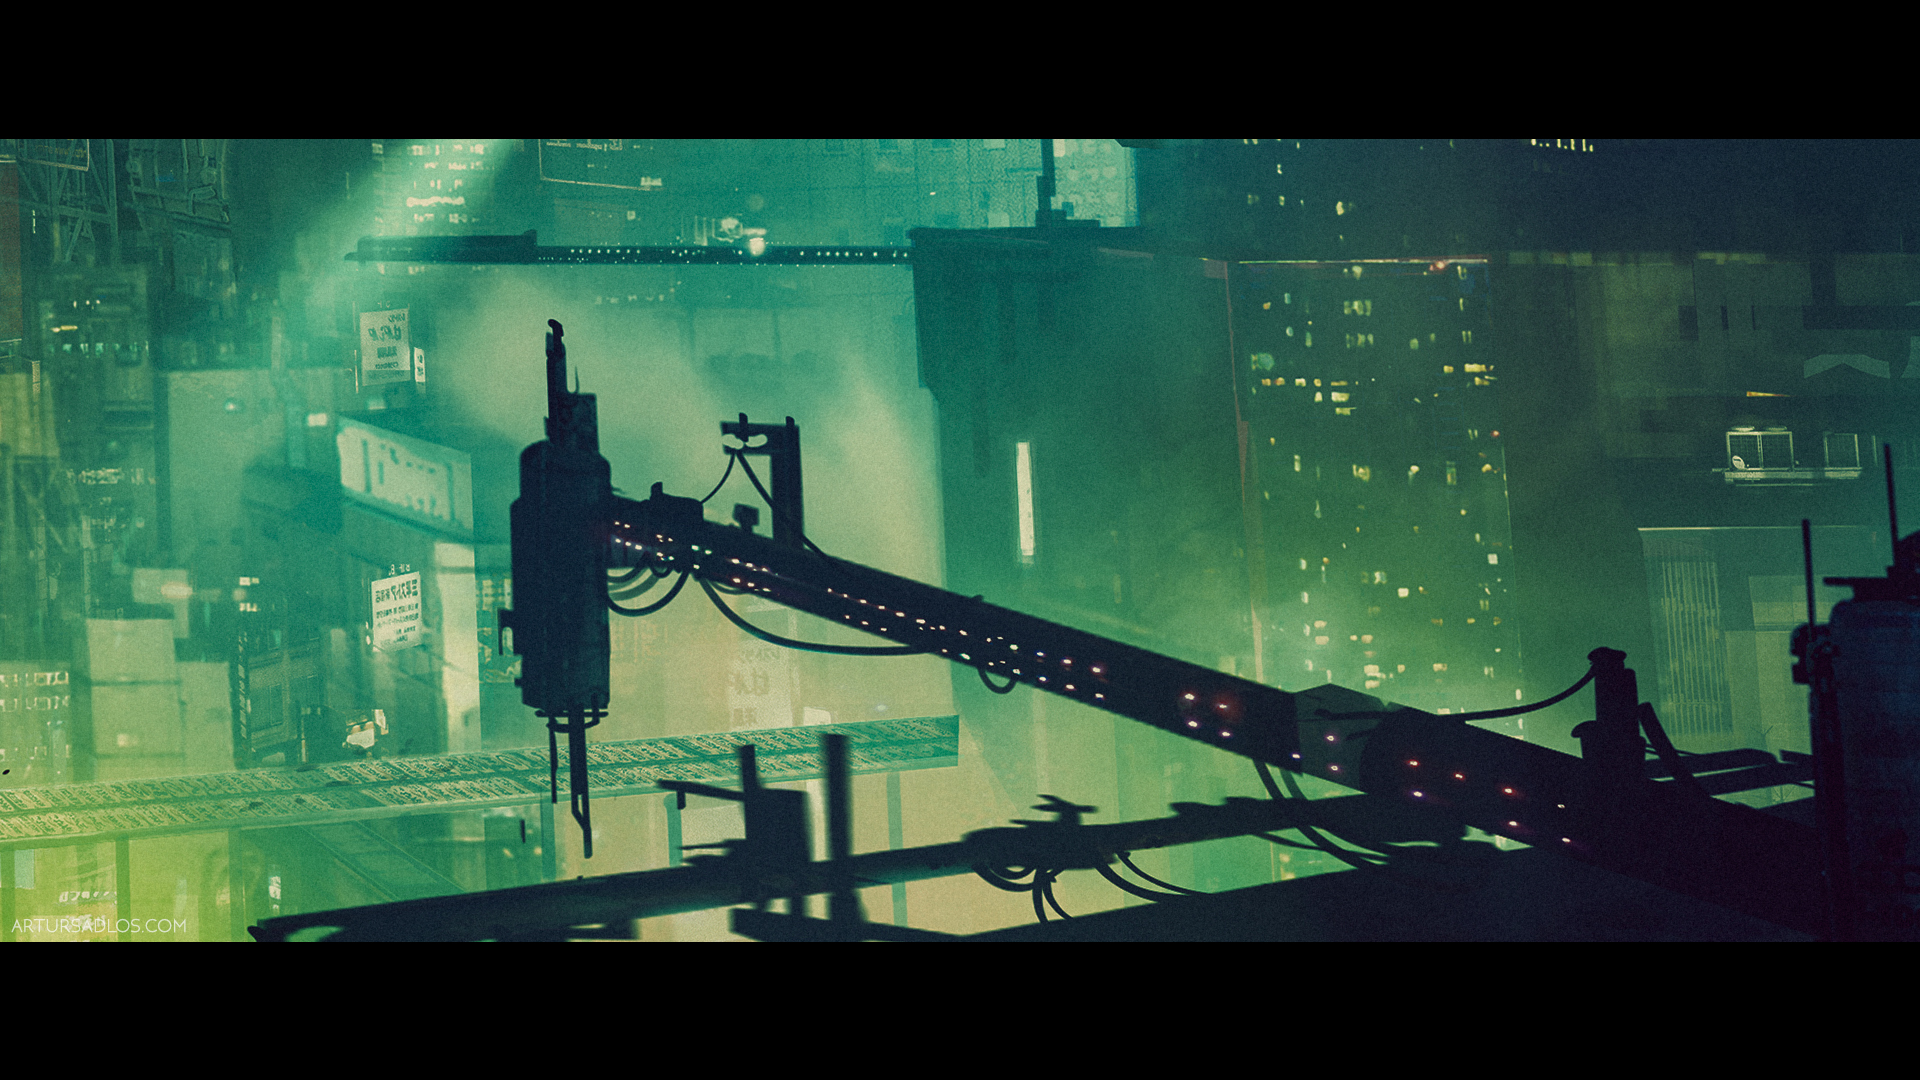 future_tokyo_003_wip004_frame004.jpg